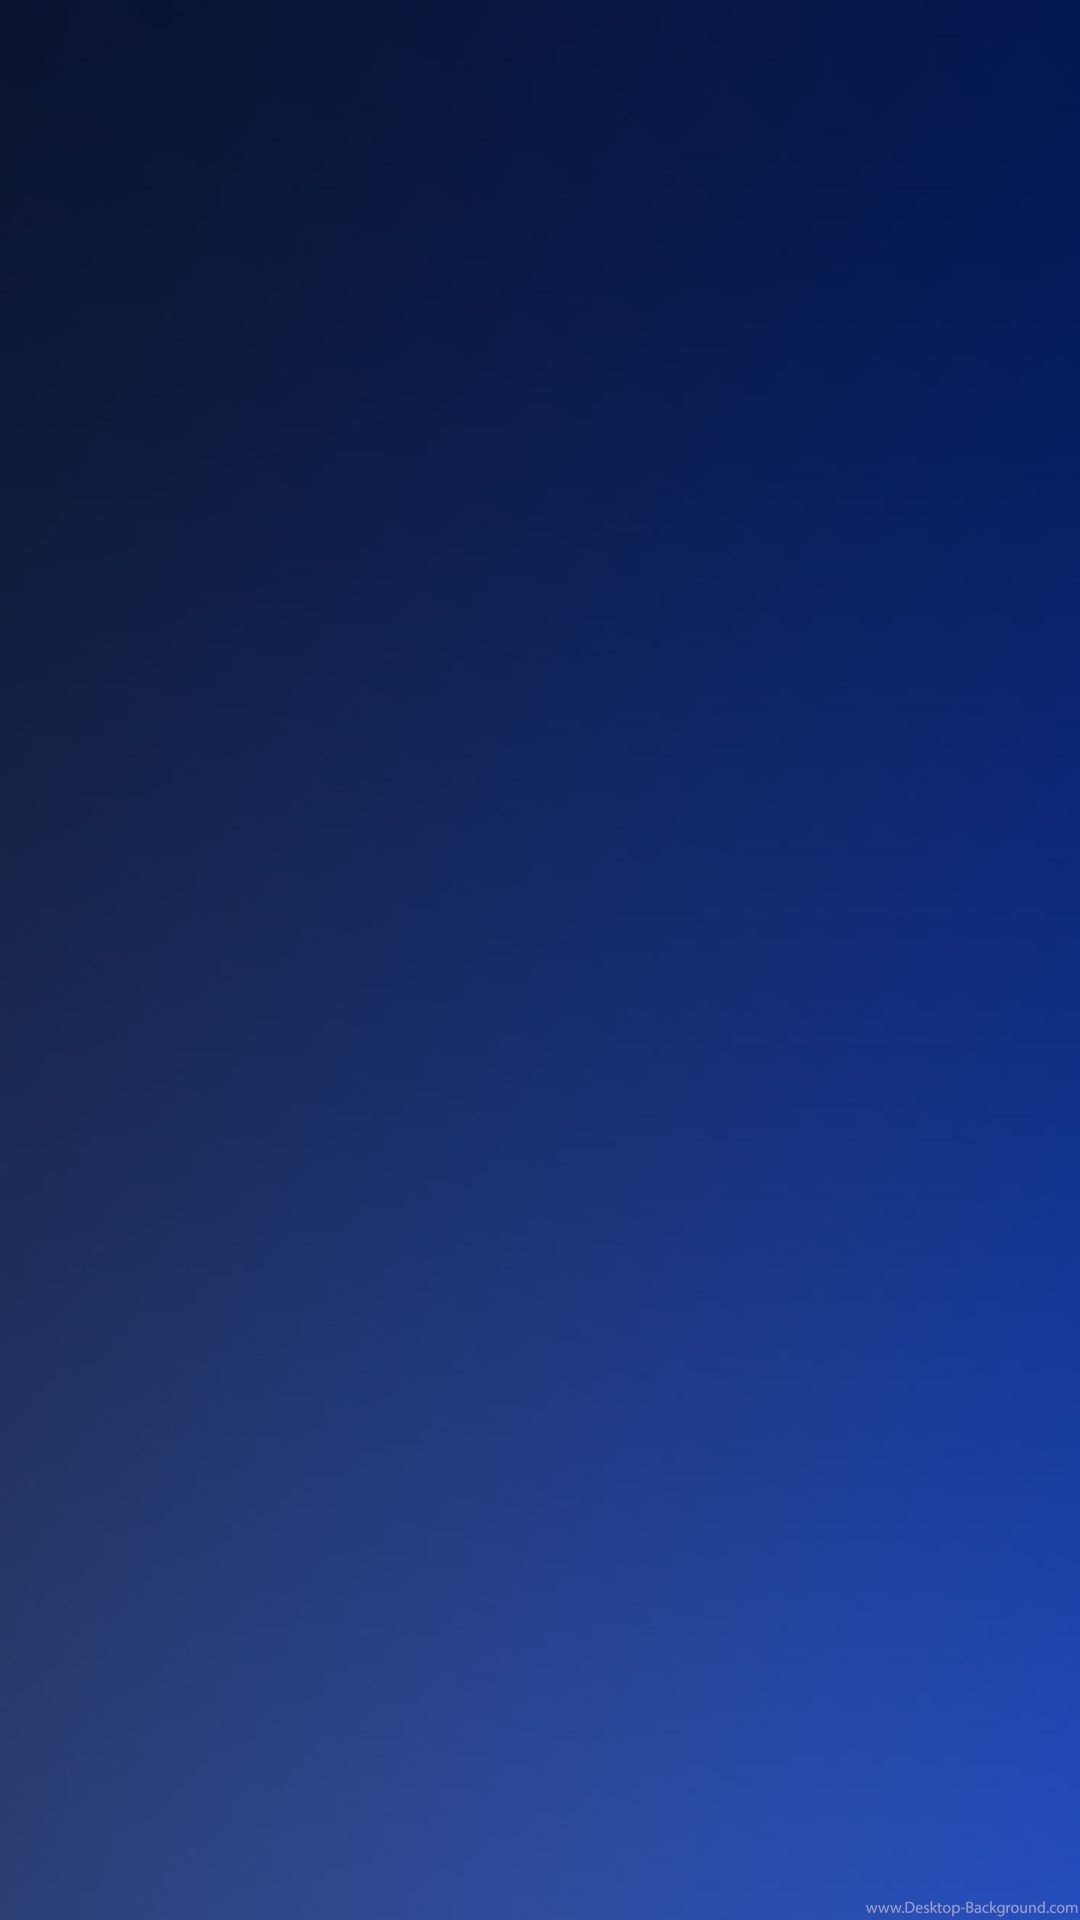 Iphone Midnight Blue Iphone Dark Blue Wallpaper Hd